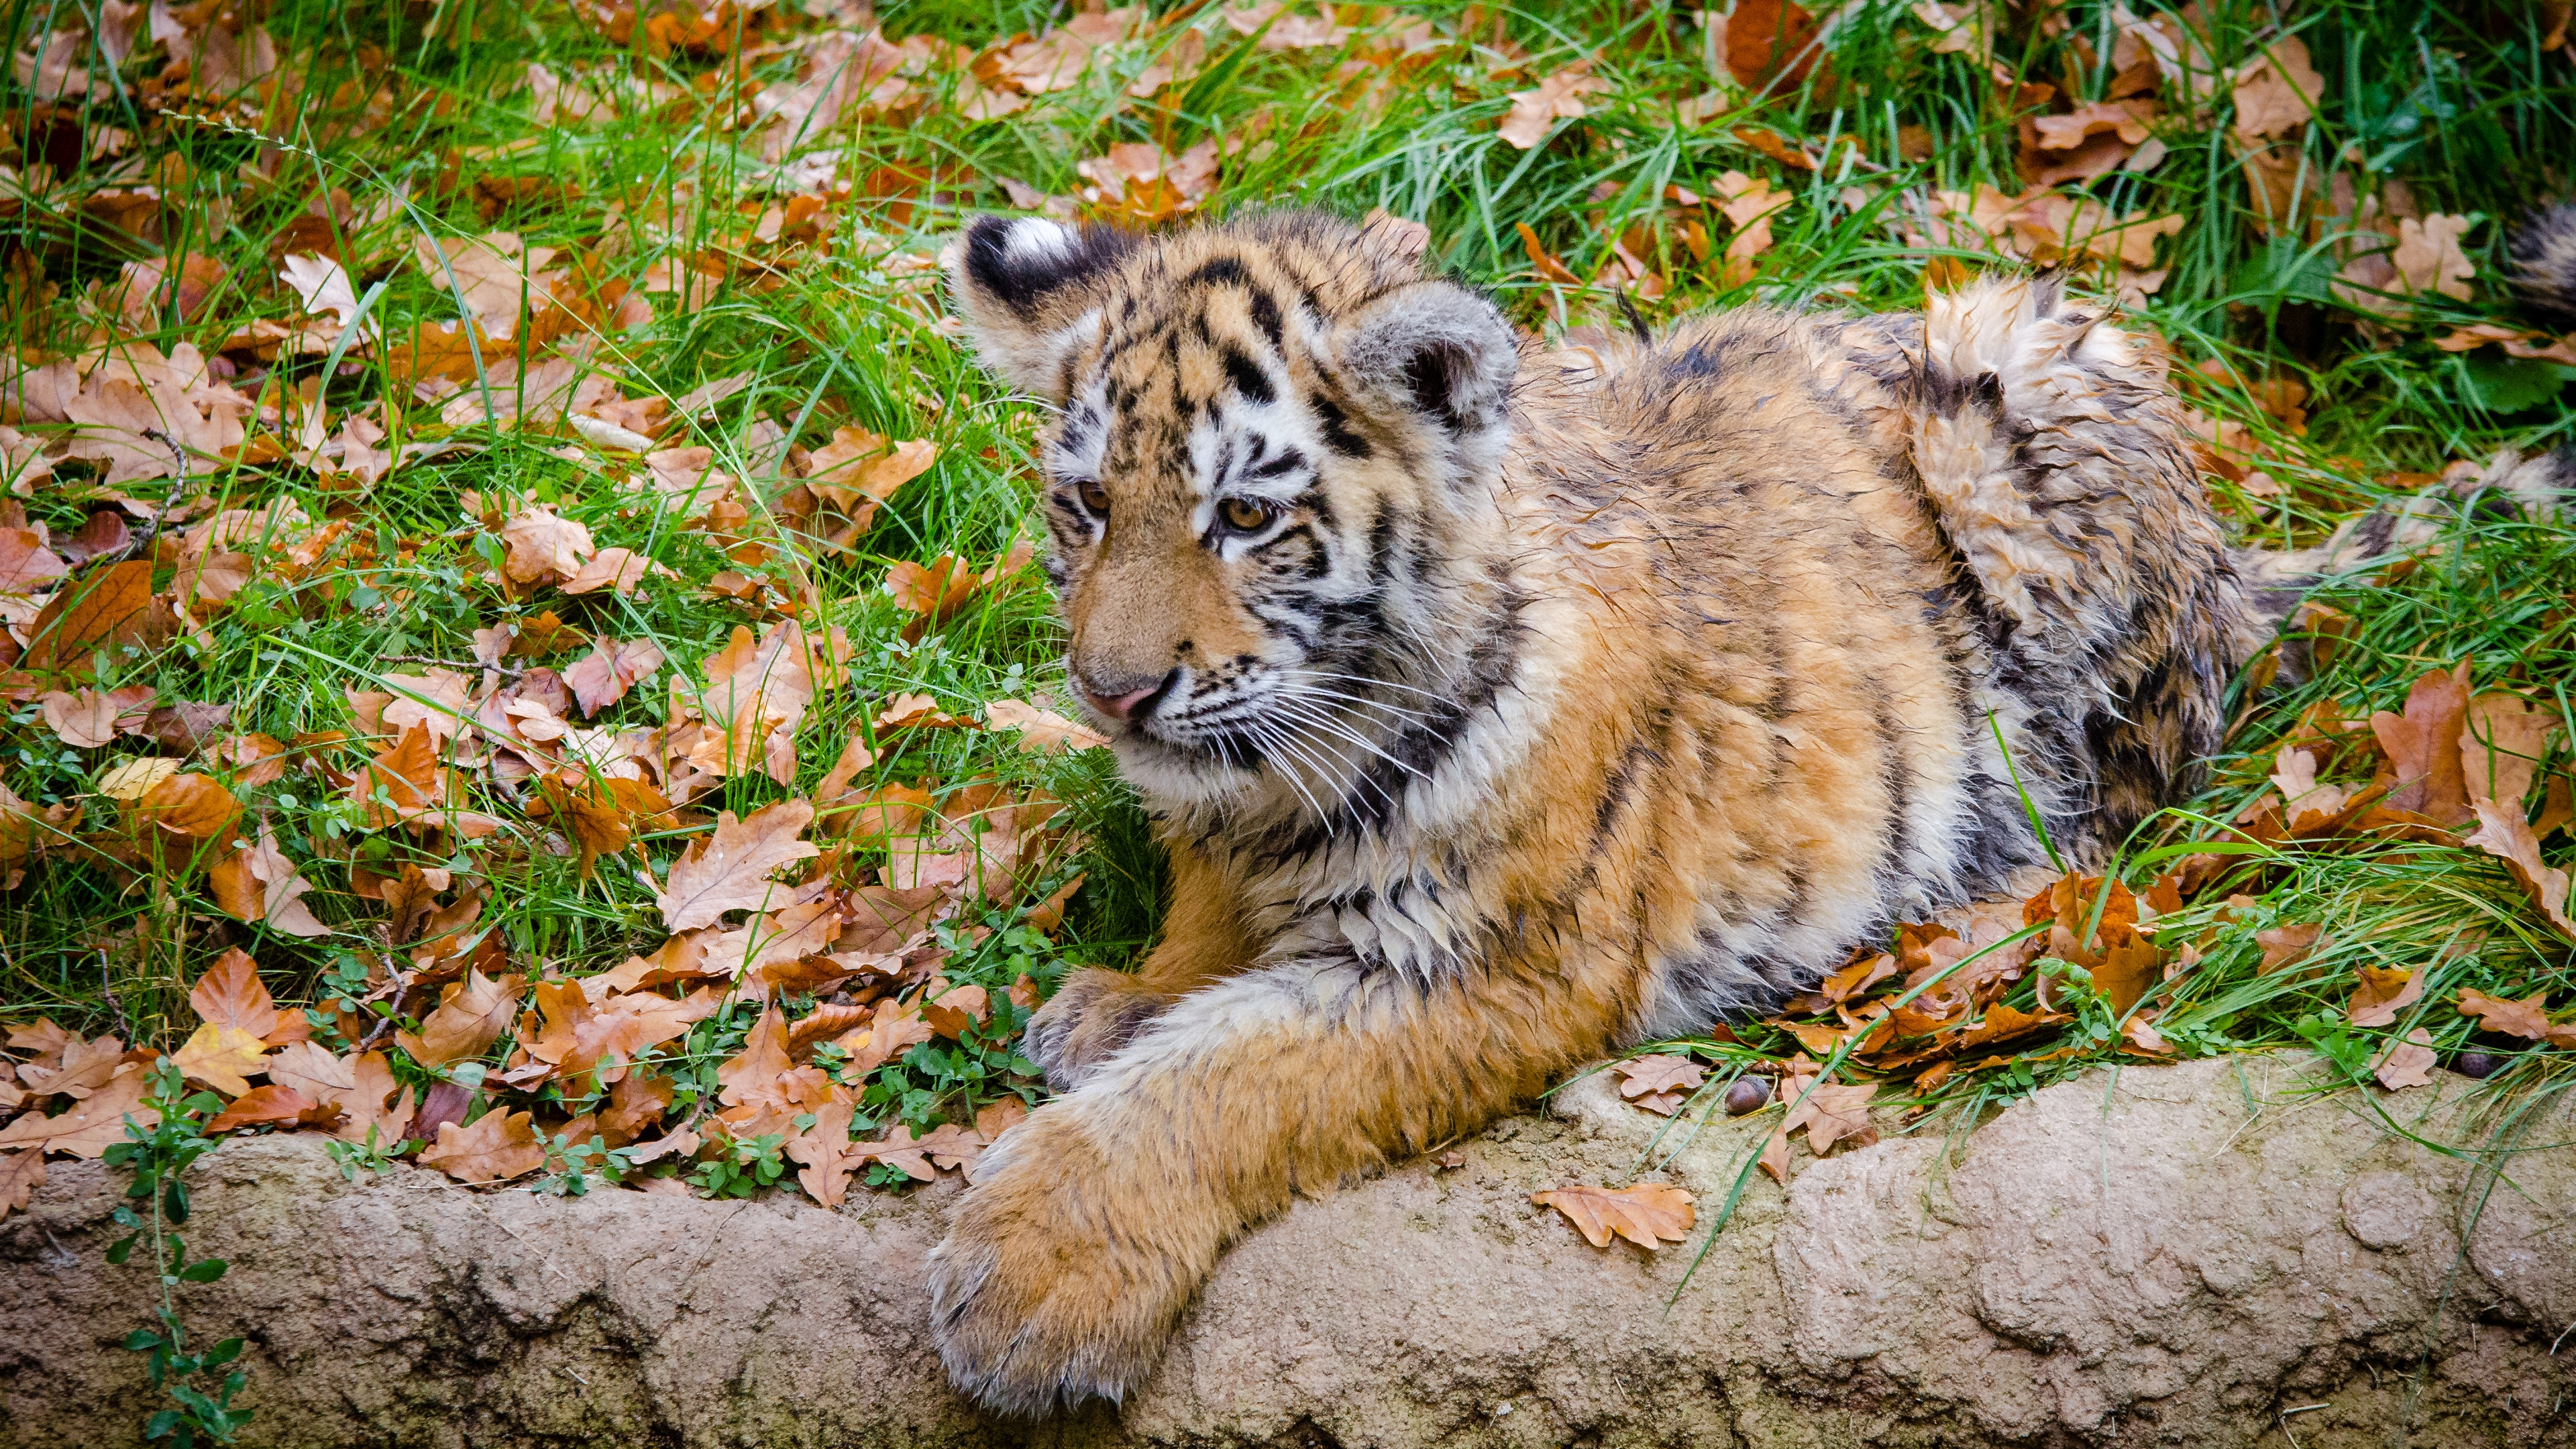 siberian tiger cub predator autumn foliage 4k 1542242149 - siberian tiger, cub, predator, autumn, foliage 4k - siberian tiger, Predator, Cub